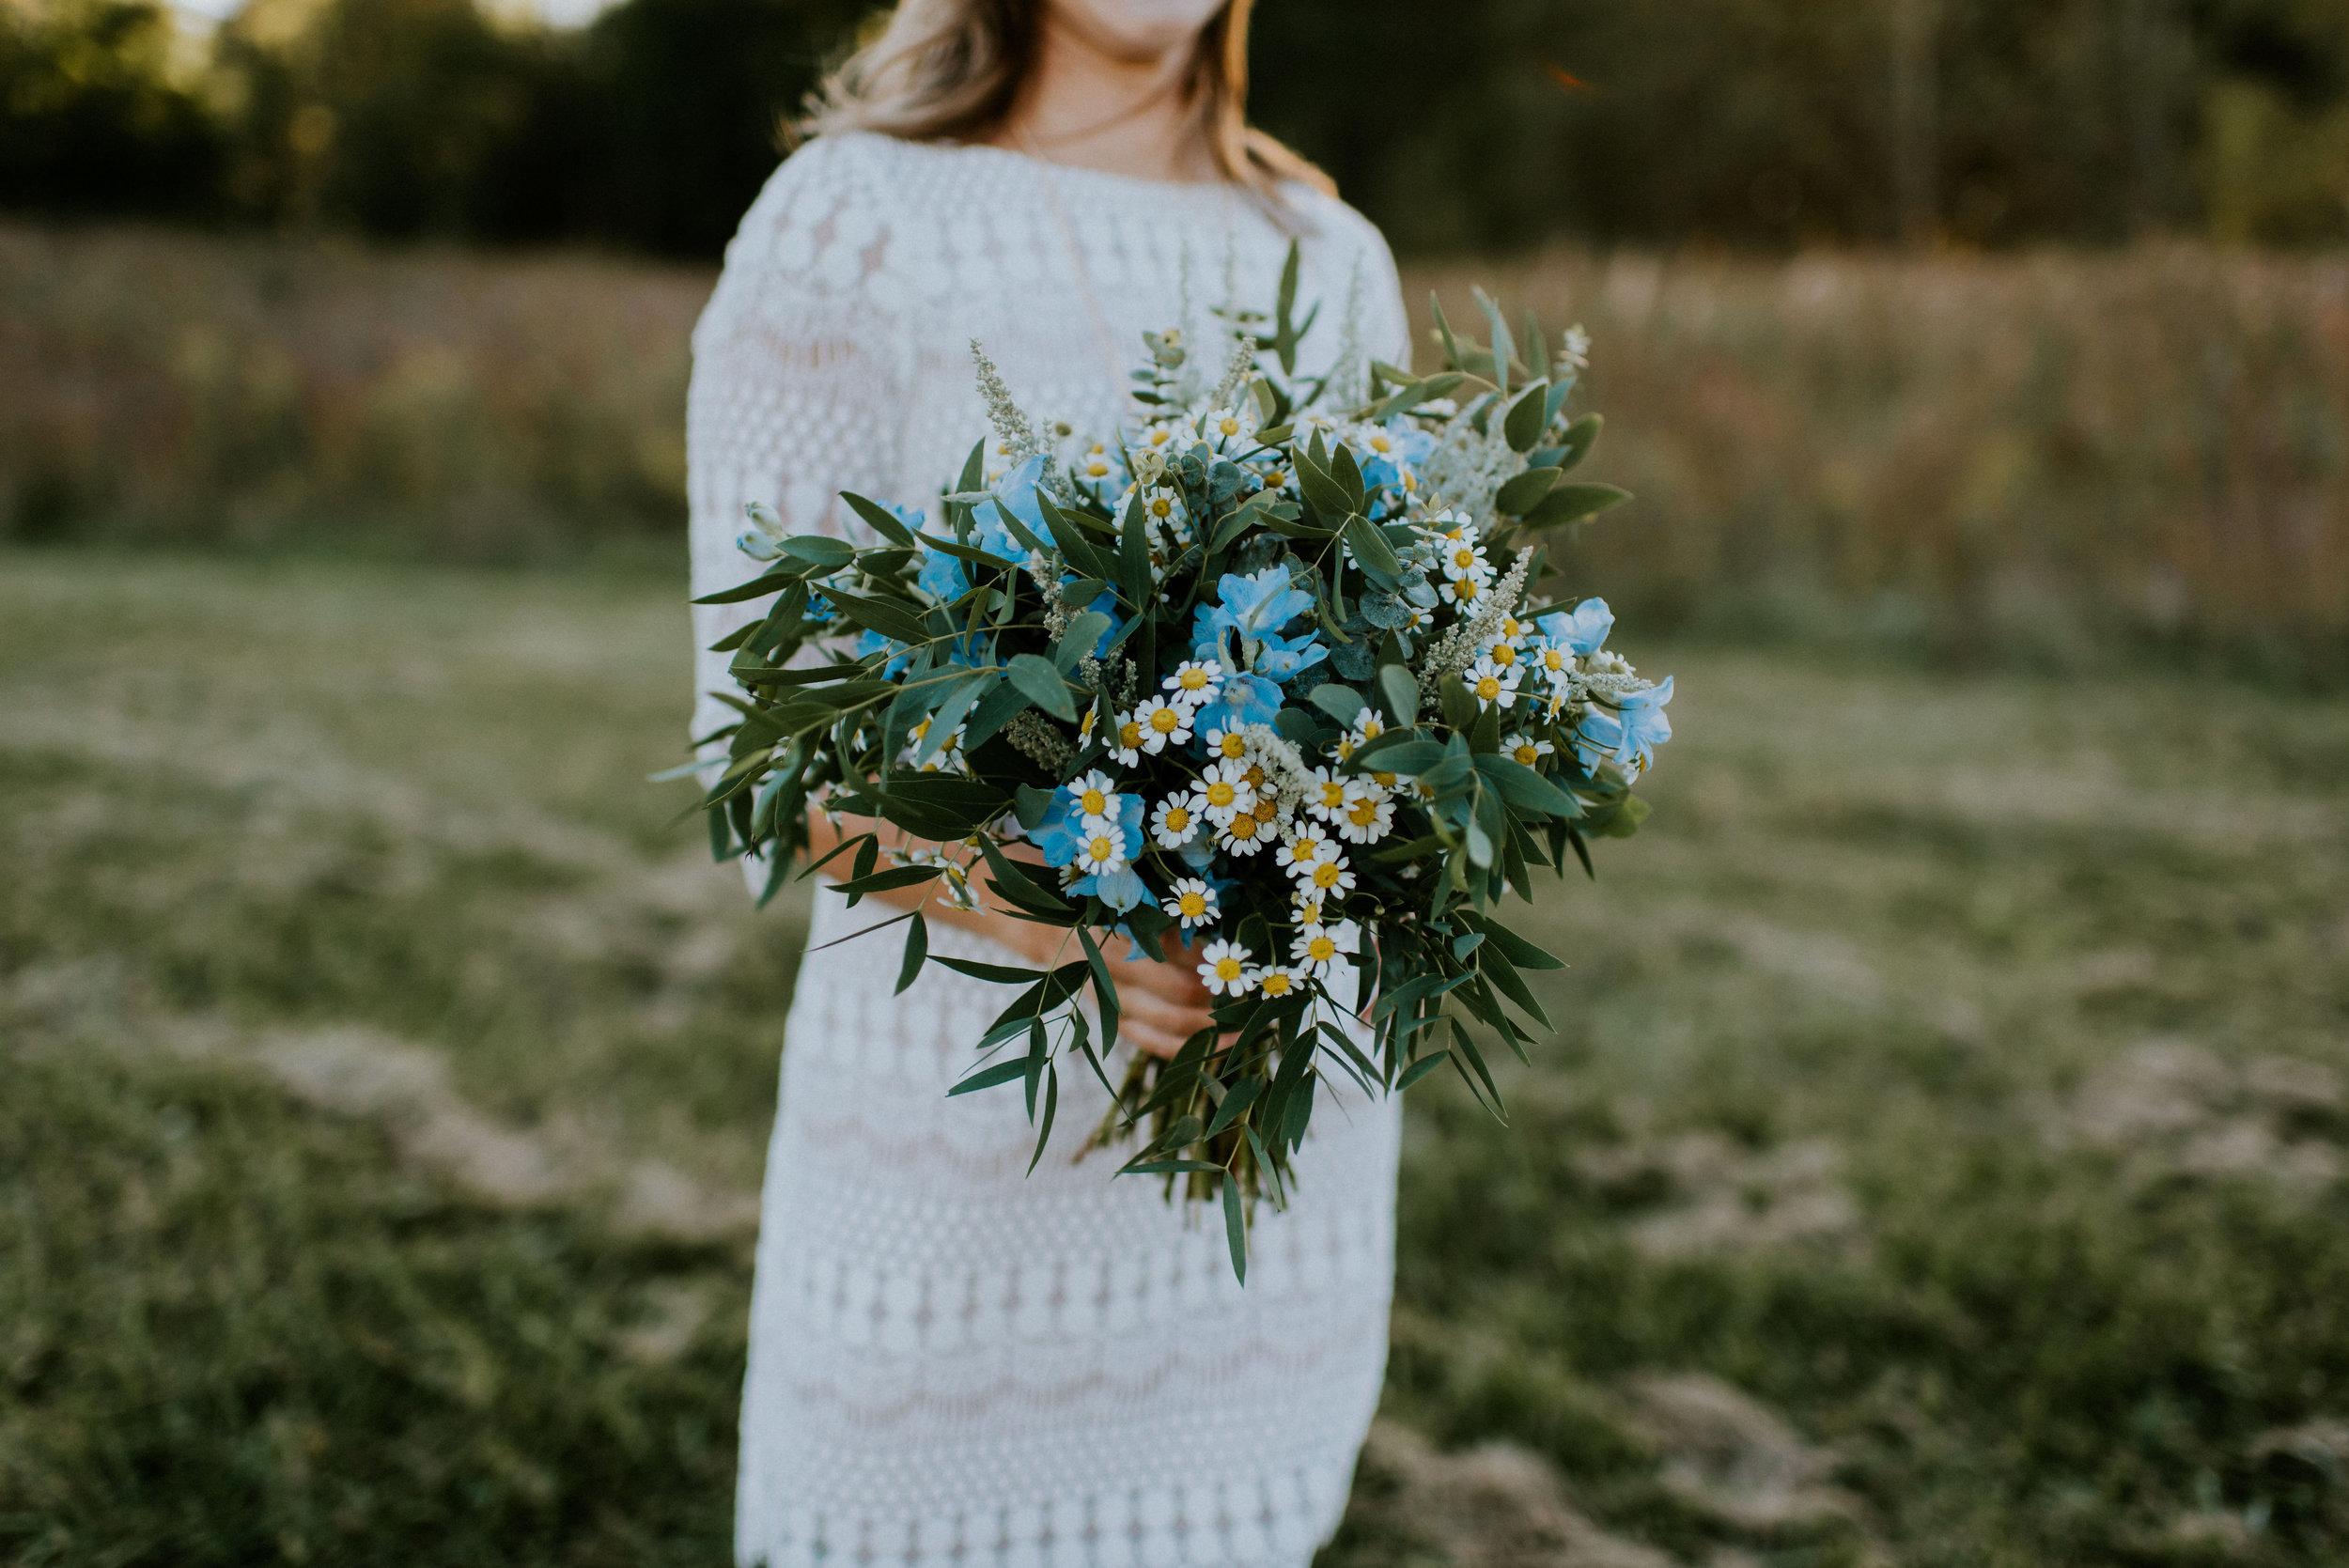 Wildflower-Field-Elopement-Vow-Renewal_Lisa+Chad_MJPHOTO-31.JPG